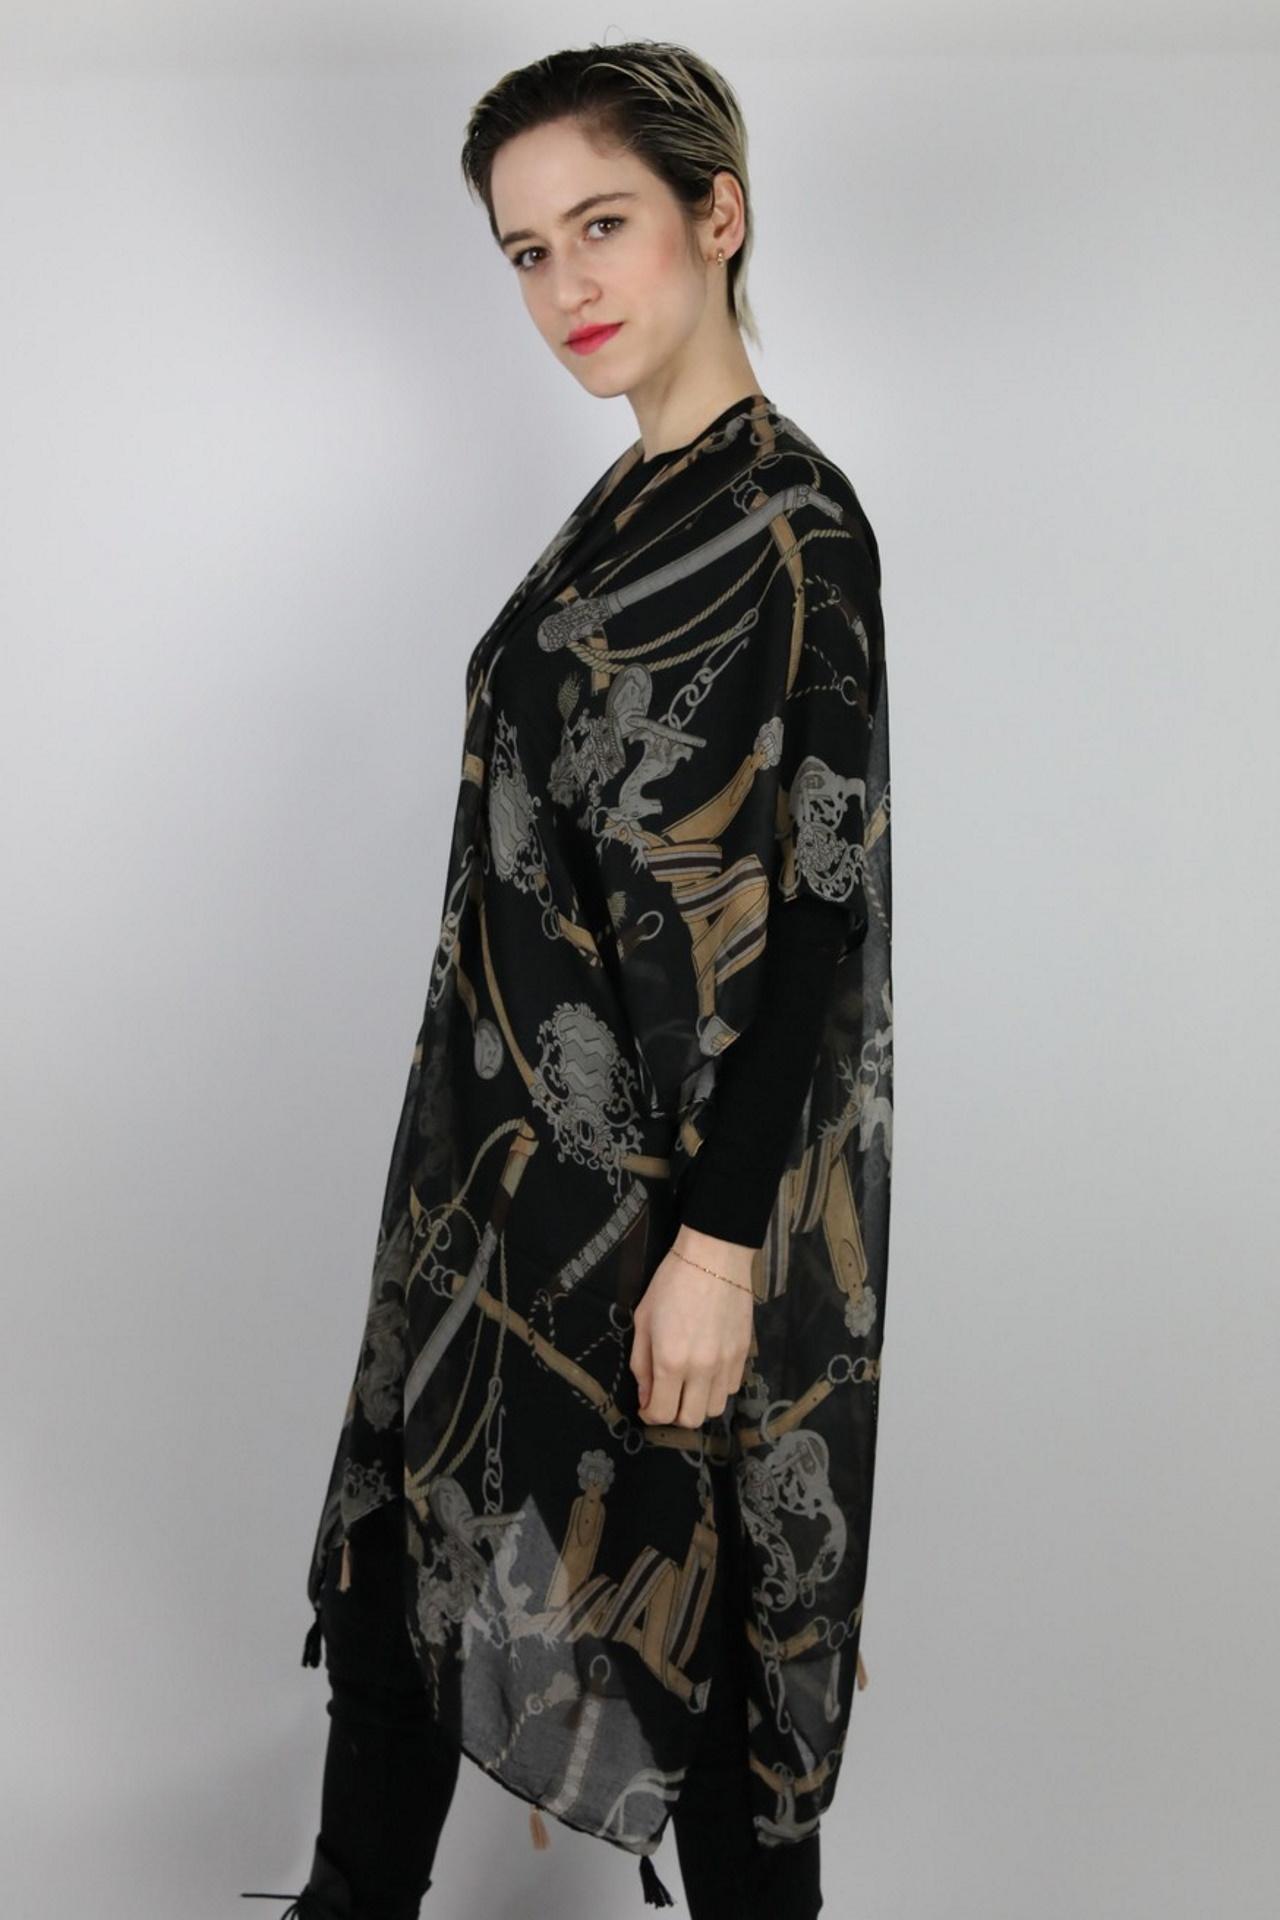 CLOTHES08 STOLA DONNA FOULARD CARDIGAN COPRISPALLE 2 1stAmerican elegante stola da donna foulard cardigan coprispalle